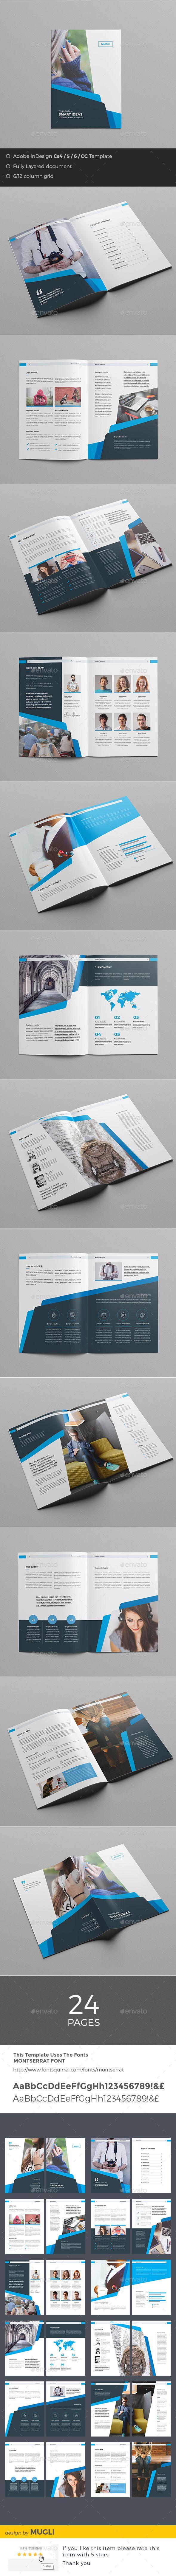 Business Brochure  — InDesign Template #swiss #portfolio • Download ➝ https://graphicriver.net/item/business-brochure/18299169?ref=pxcr